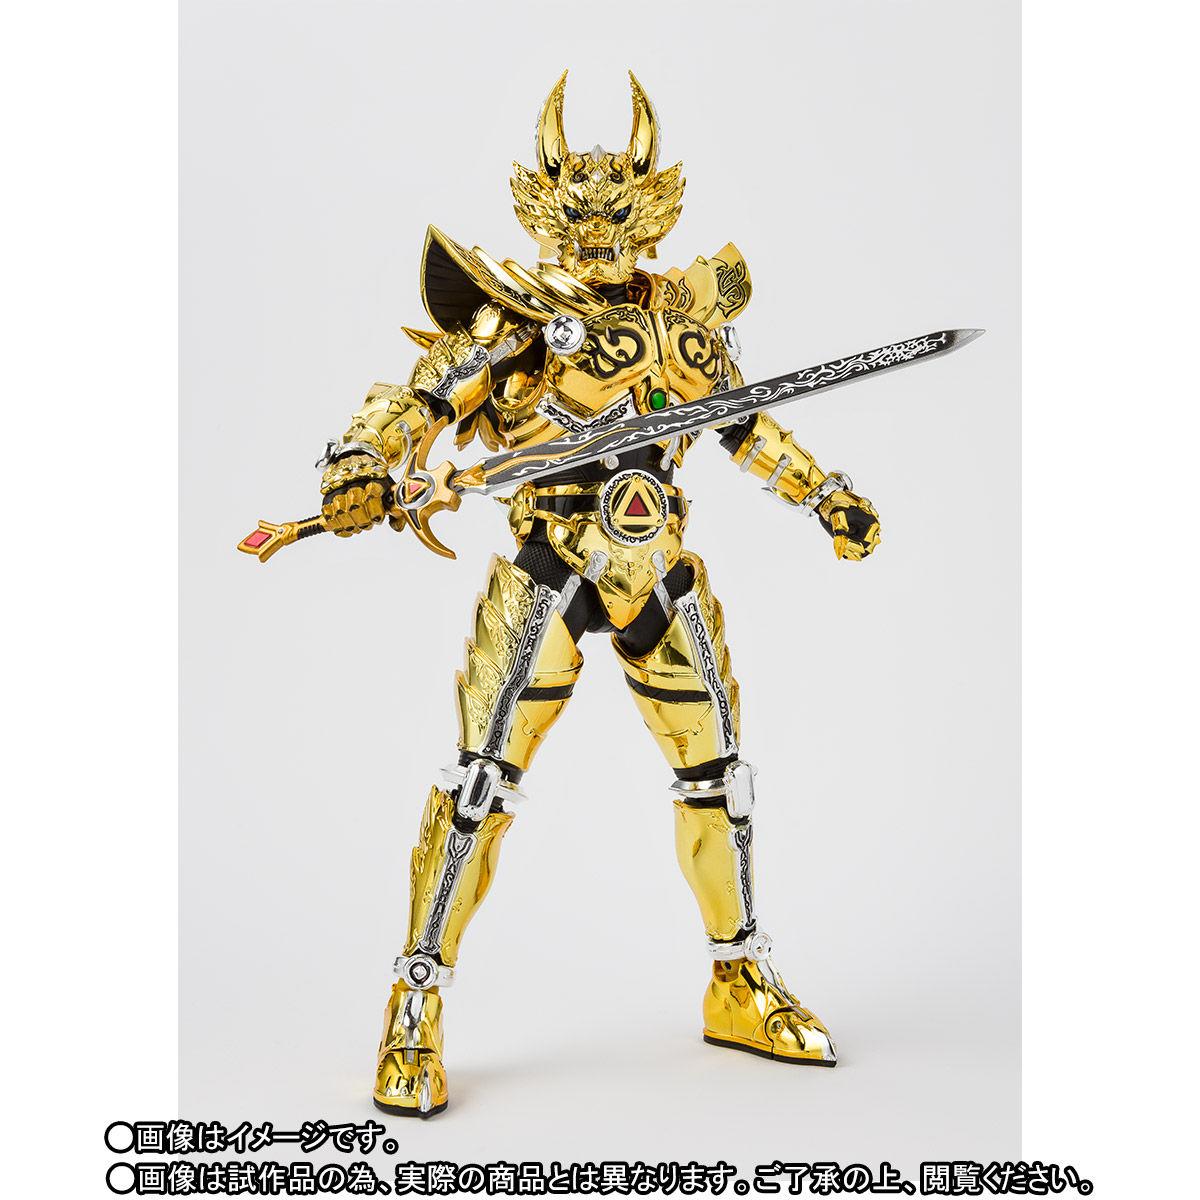 S.H.フィギュアーツ(真骨彫製法)『黄金騎士ガロ(冴島雷牙)』牙狼〈GARO〉可動フィギュア-002